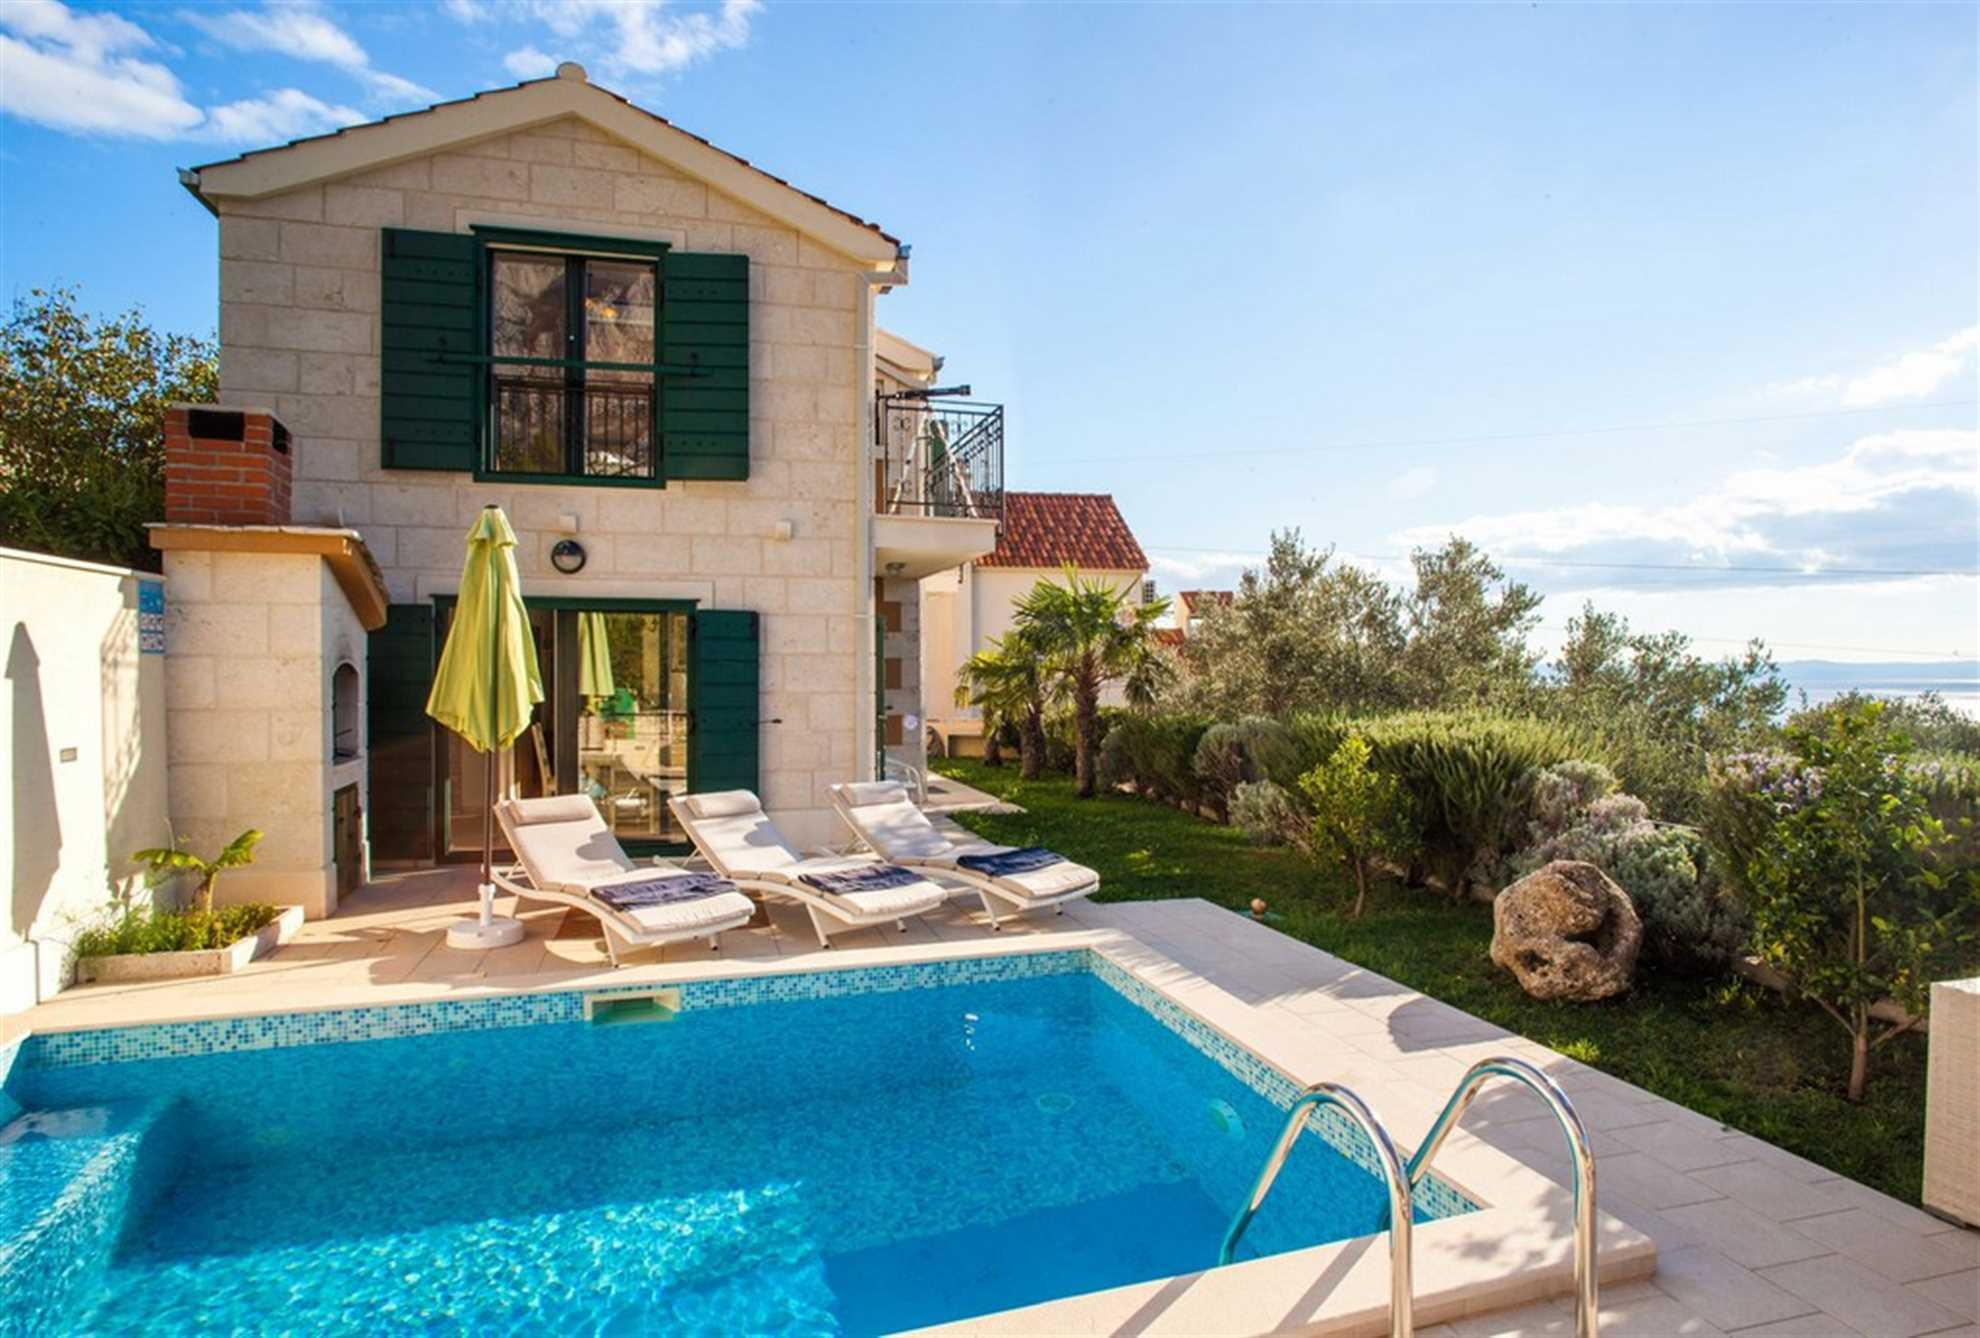 Luxury Villa Nirvana with Swimming Pool